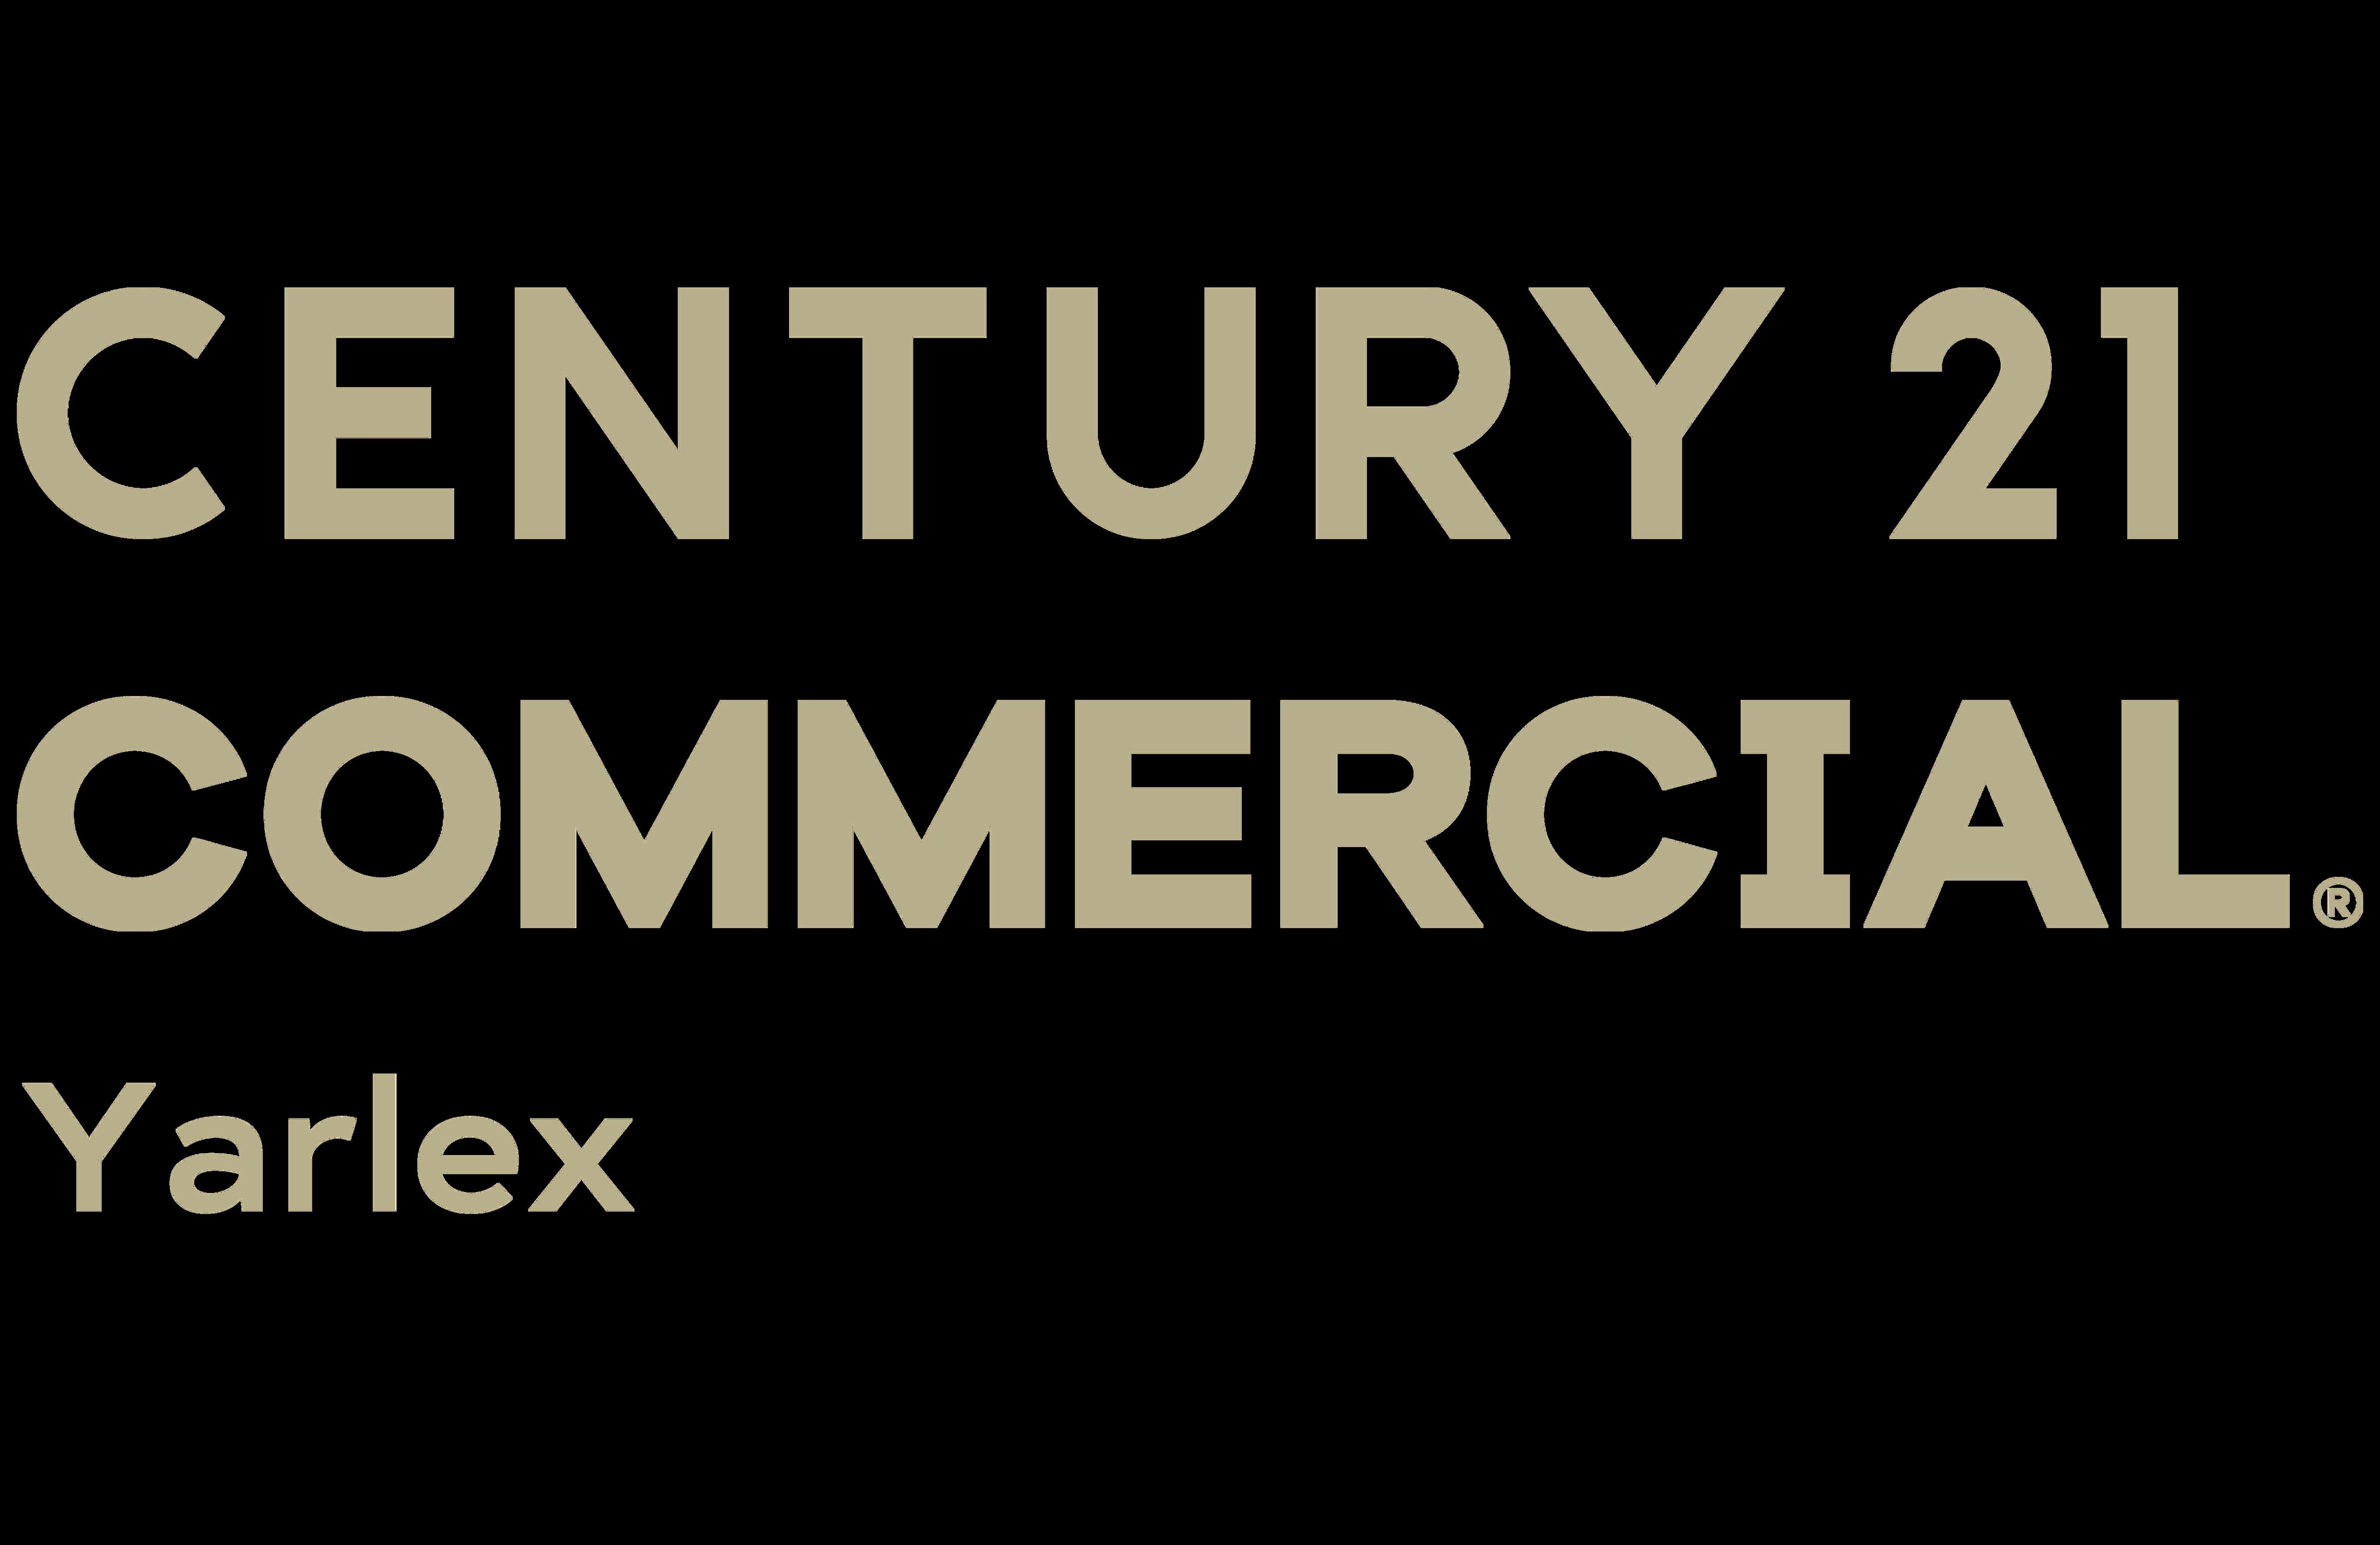 CENTURY 21 Yarlex